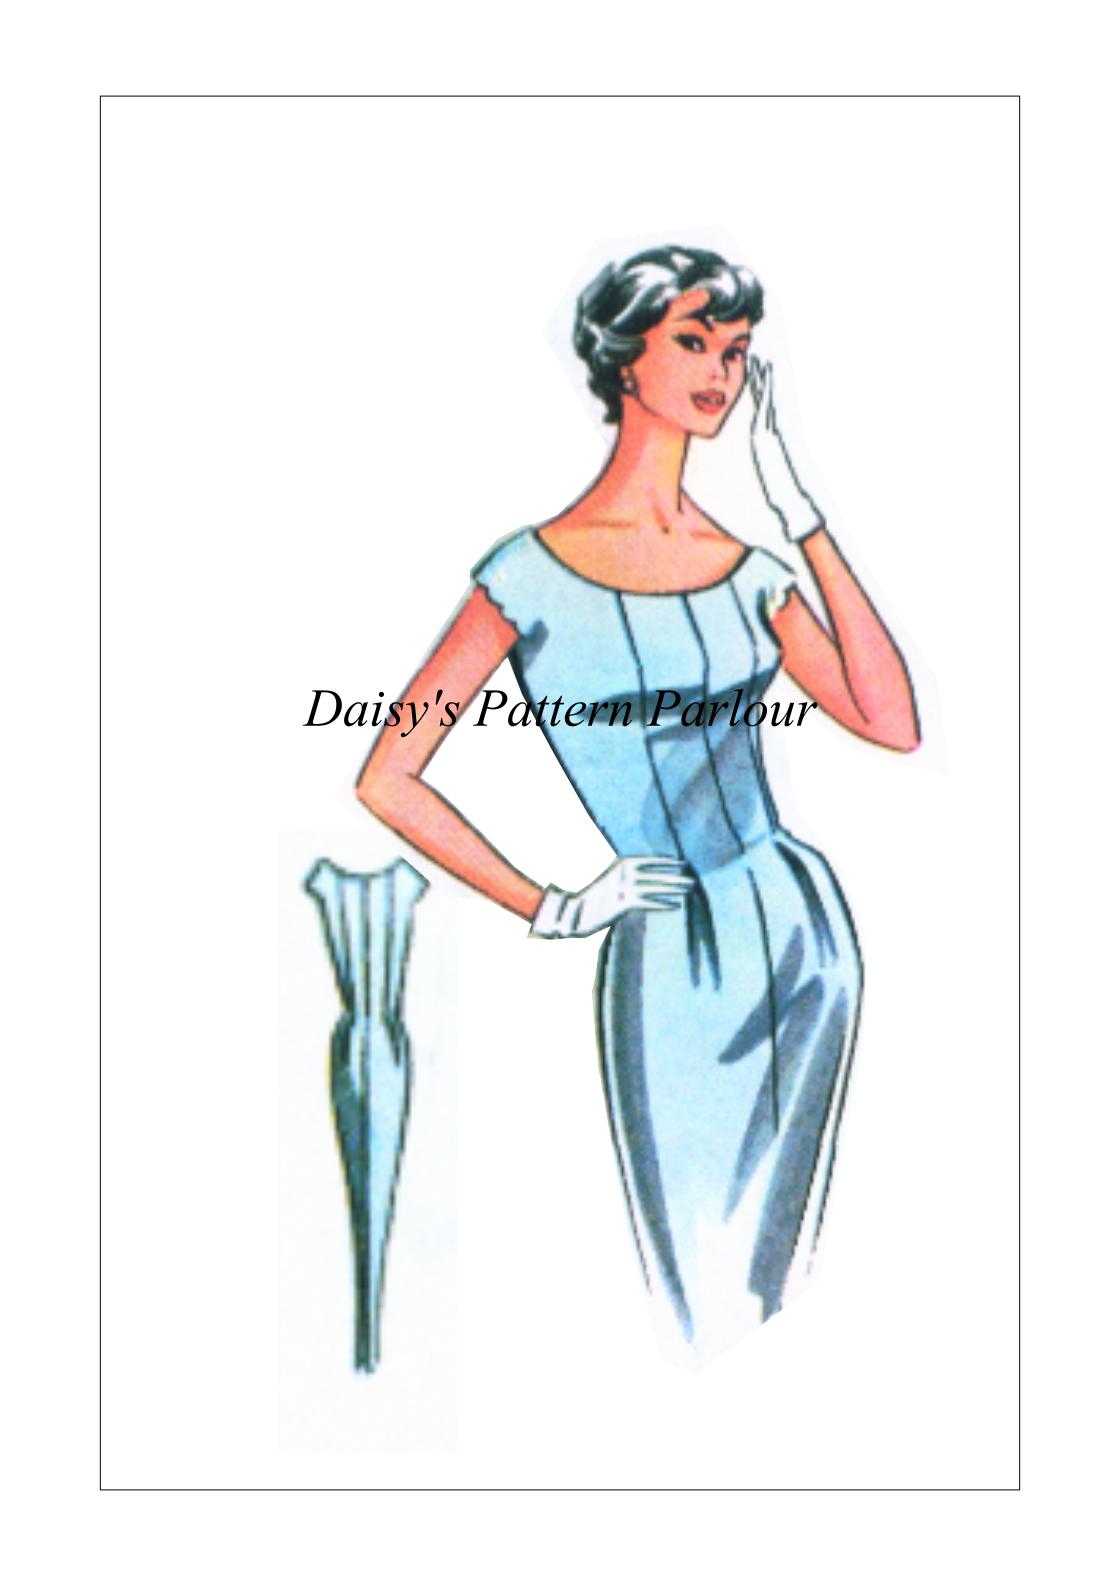 1940s Vintage Sewing Pattern Bullet Bra Wiggle Eclair Coupe Paris 1950 1940 40s